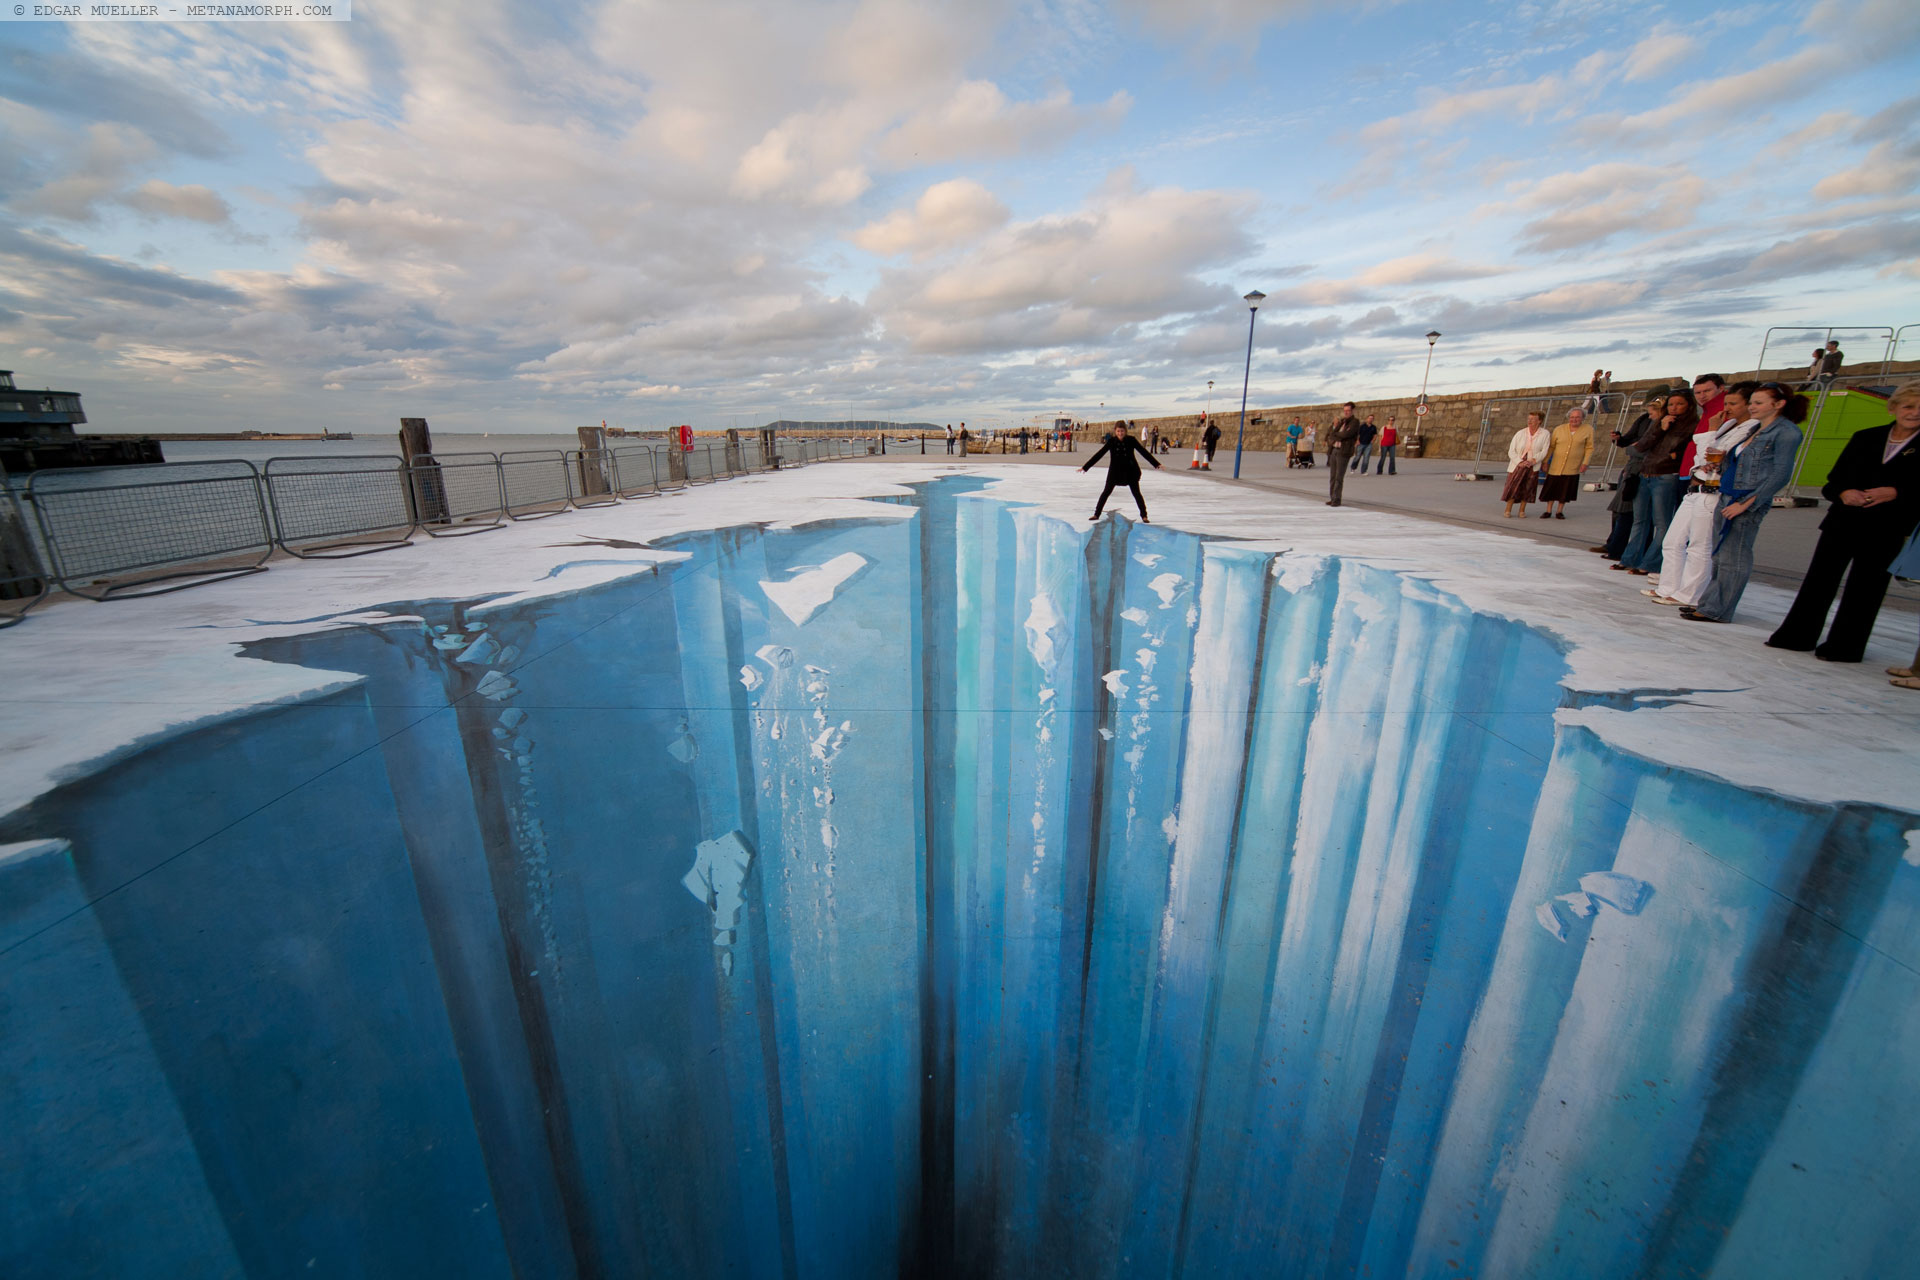 3D-Gemälde des Straßenmalers Edgar Müller